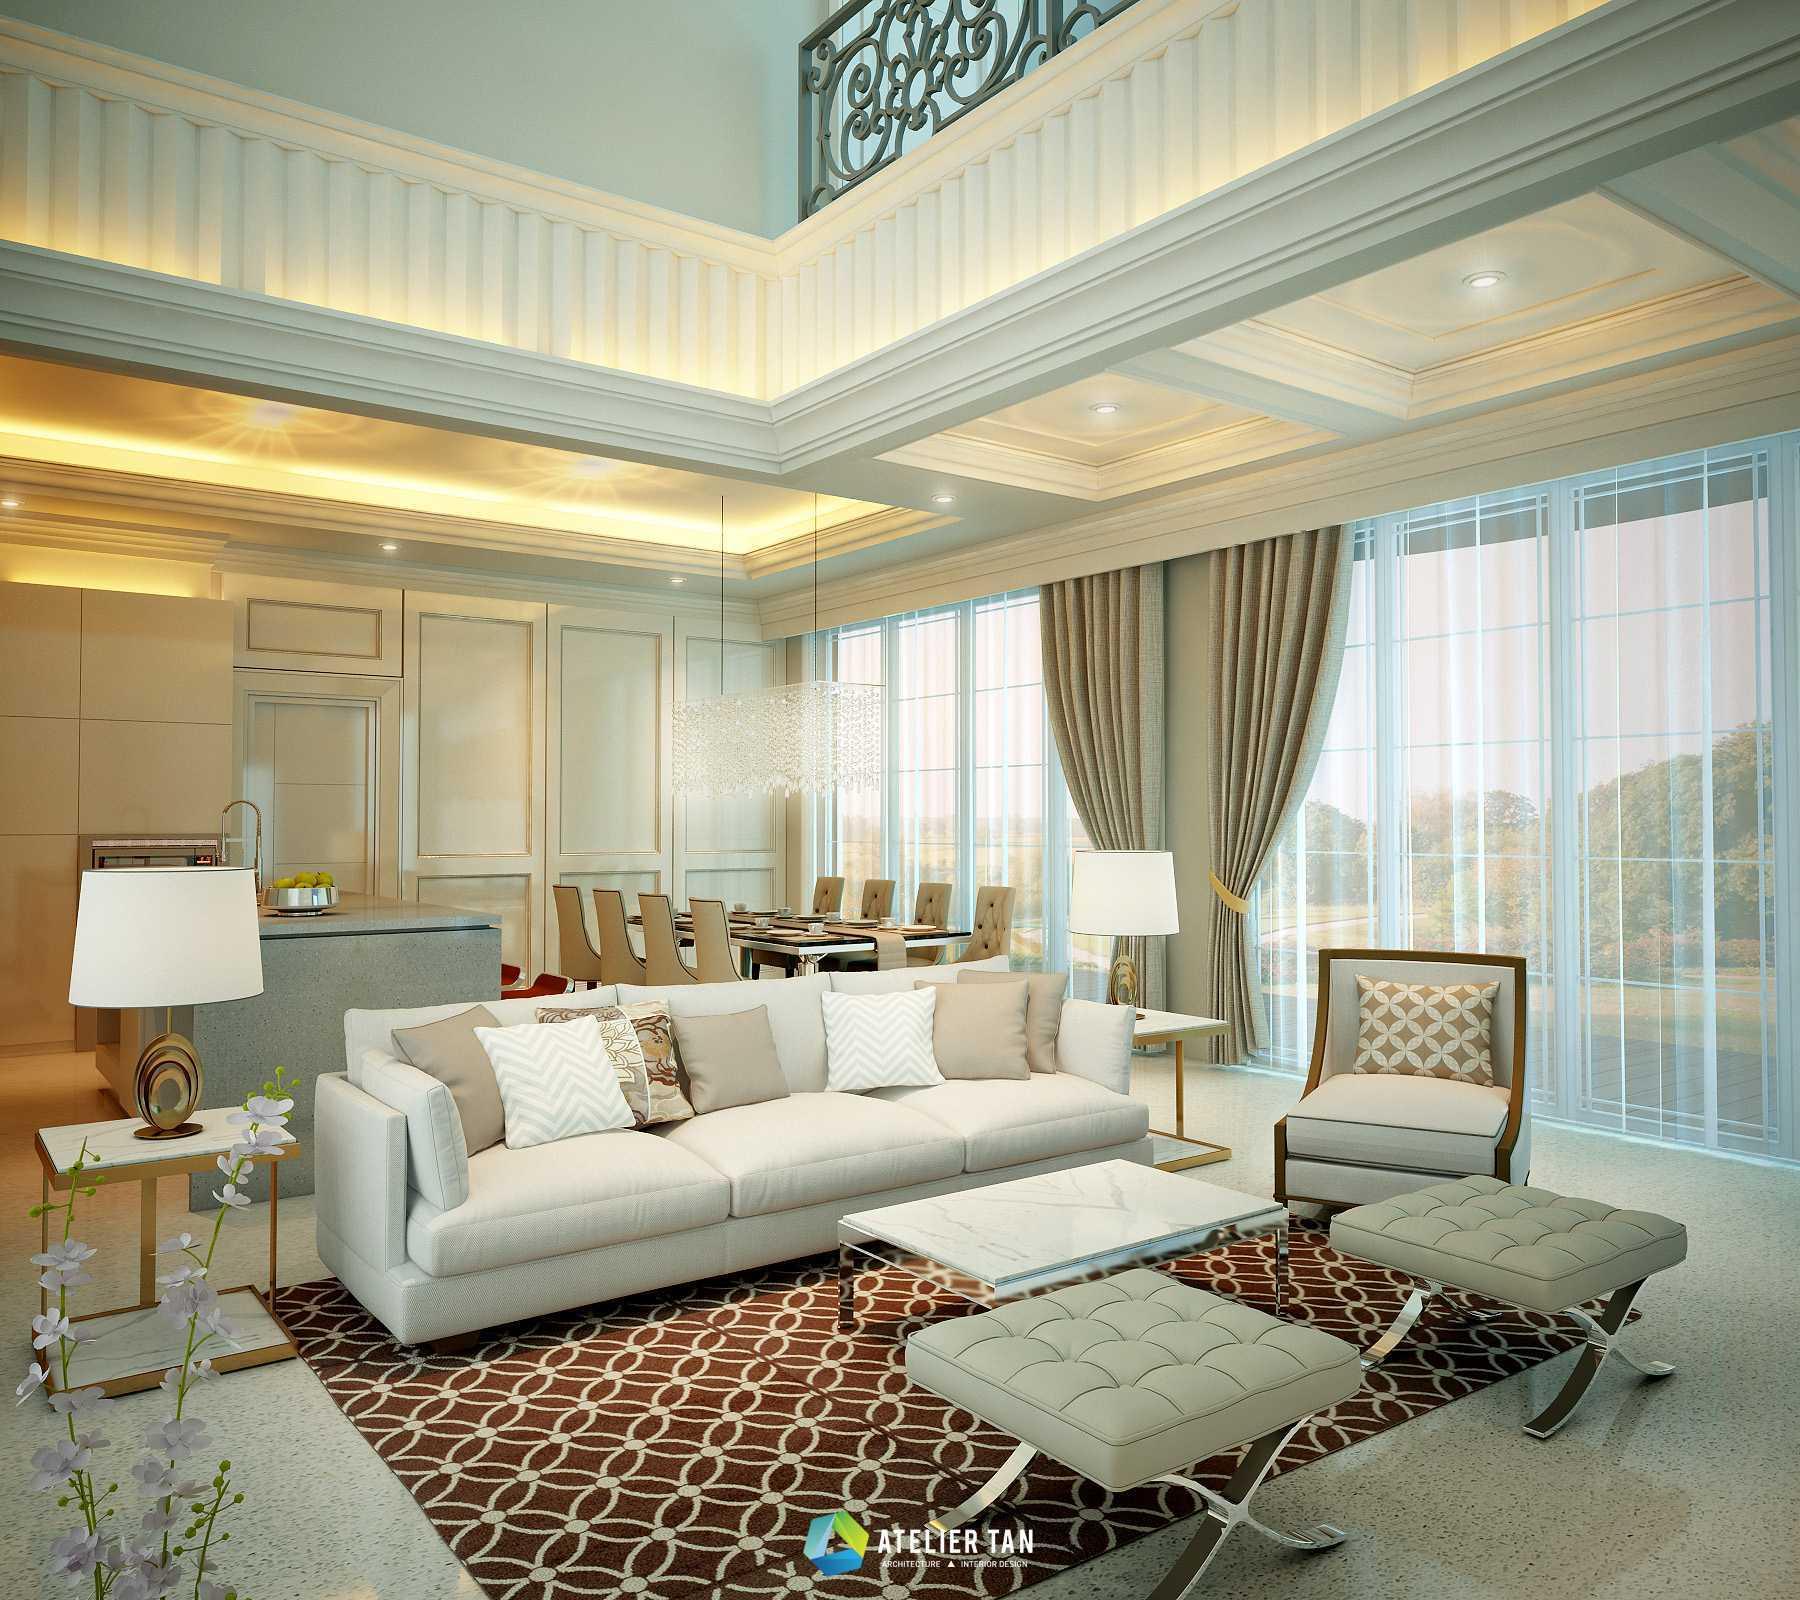 Ateliertan W+H House Jakarta Jakarta Draft-04 Klasik <P>W+H House - Livingroom</p> 44783